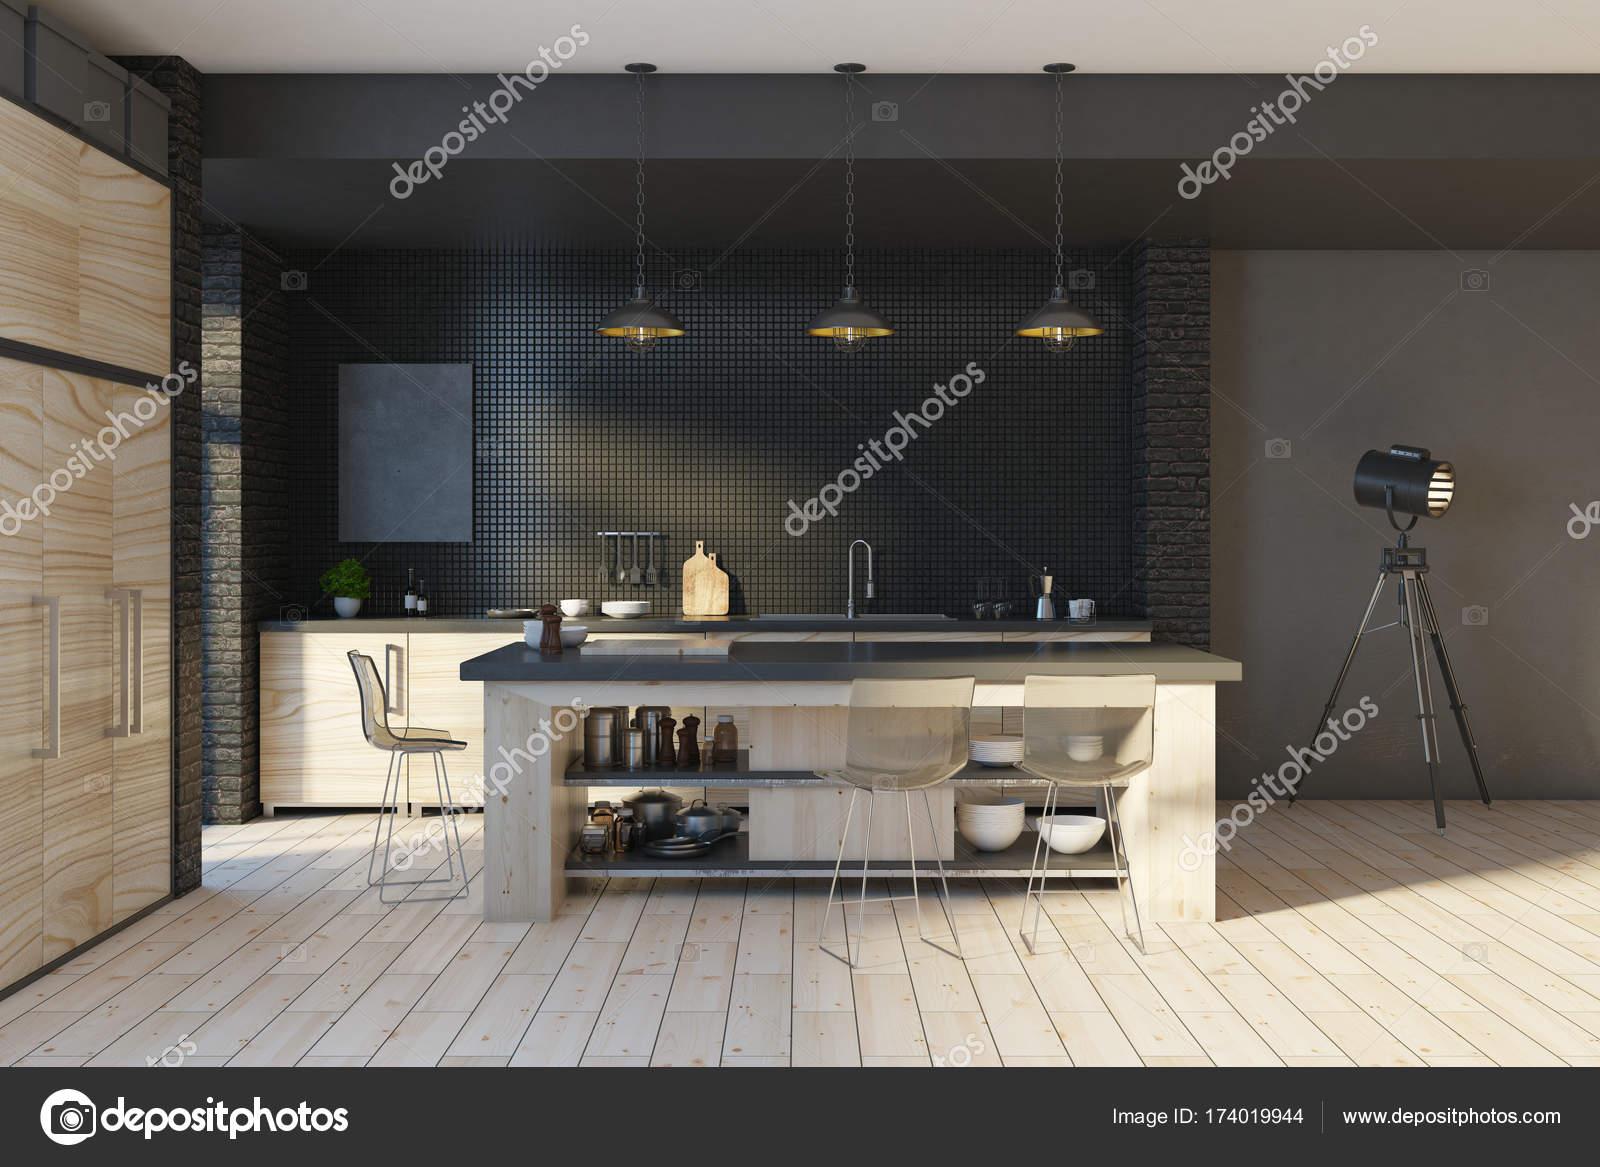 Keuken Moderne Zwart : Moderne loft zwart keuken interieur u stockfoto peshkova